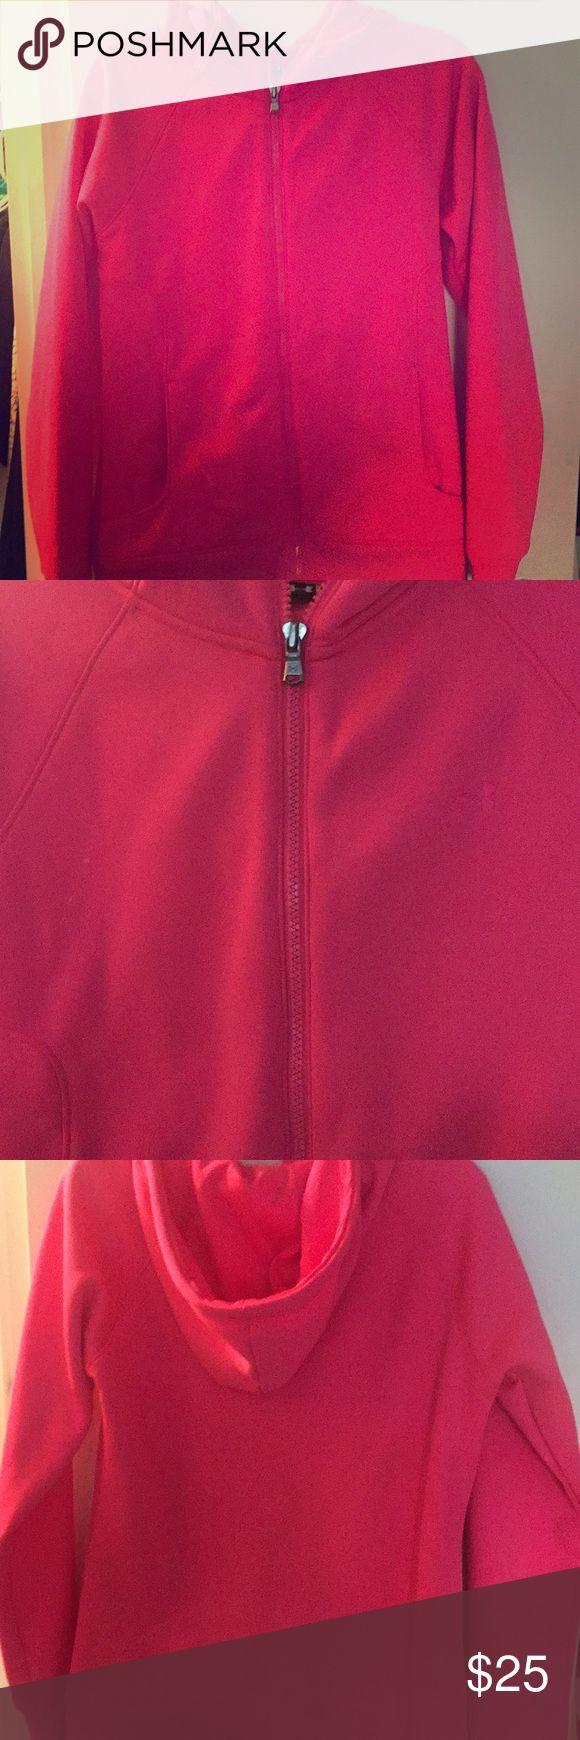 Under Amour Pink Hoody Cute Under Amour Hoody Under Armour Tops Sweatshirts & Hoodies